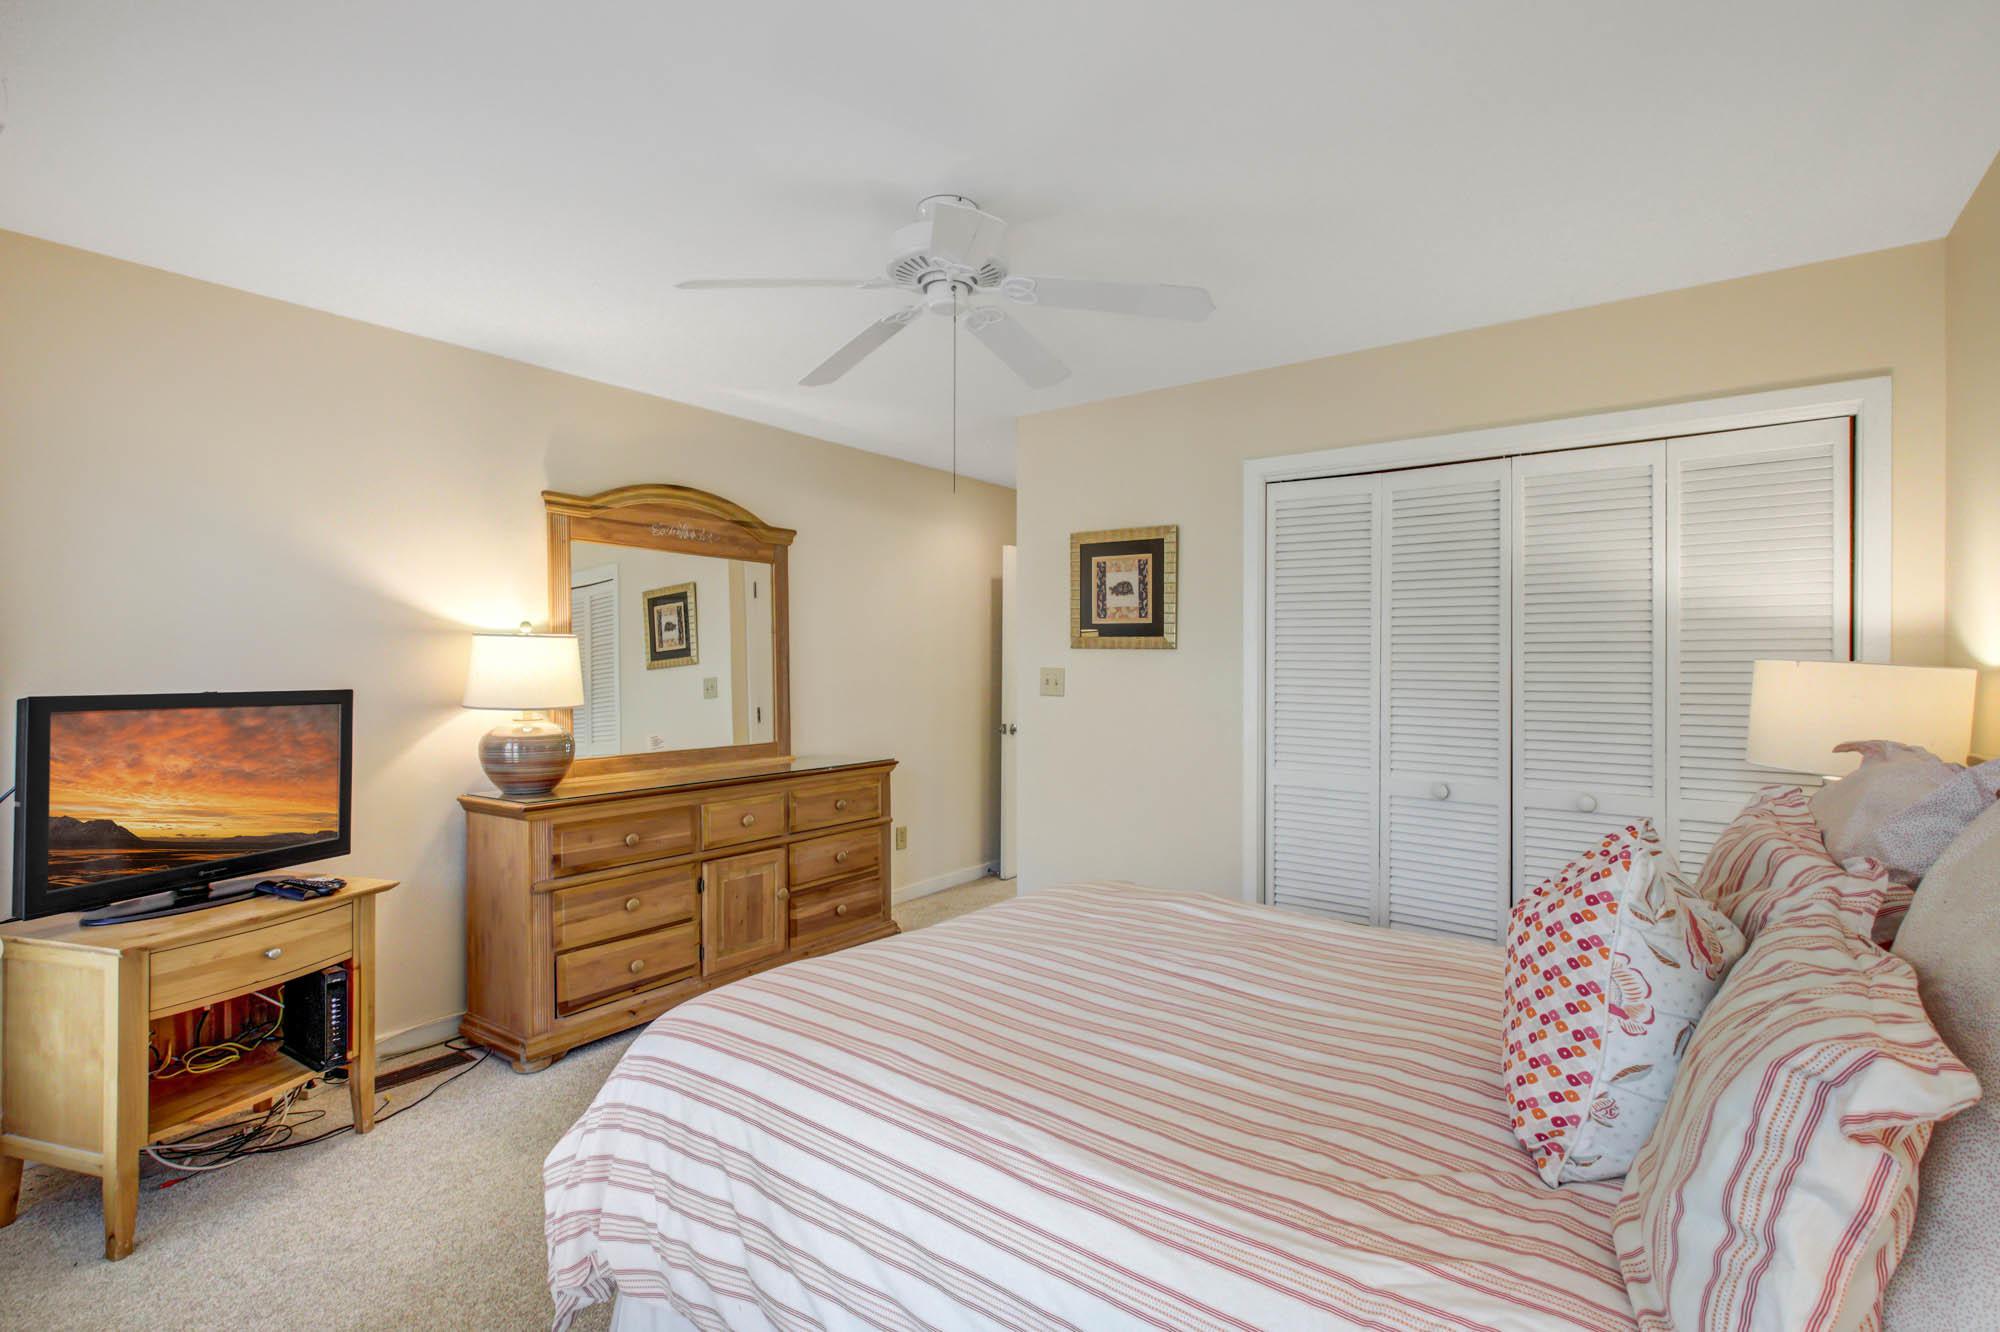 Kiawah Island Condos For Sale - 4525 Park Lake, Kiawah Island, SC - 27